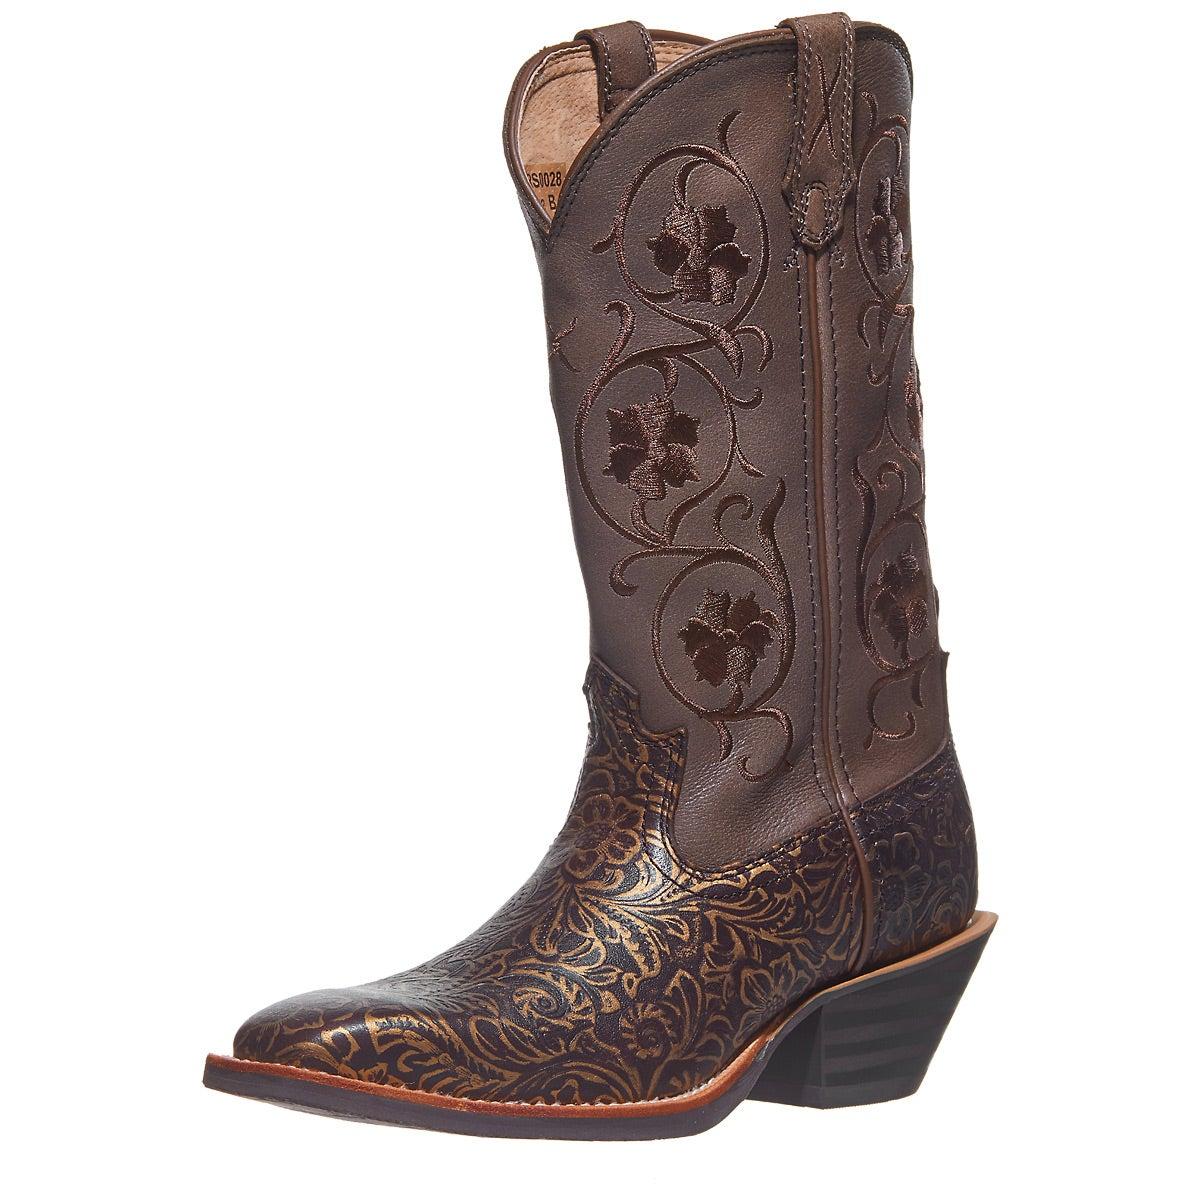 0cf38df13fb Twisted X Women's Ruff Stock Filigree Cowboy Boots - Riding Warehouse